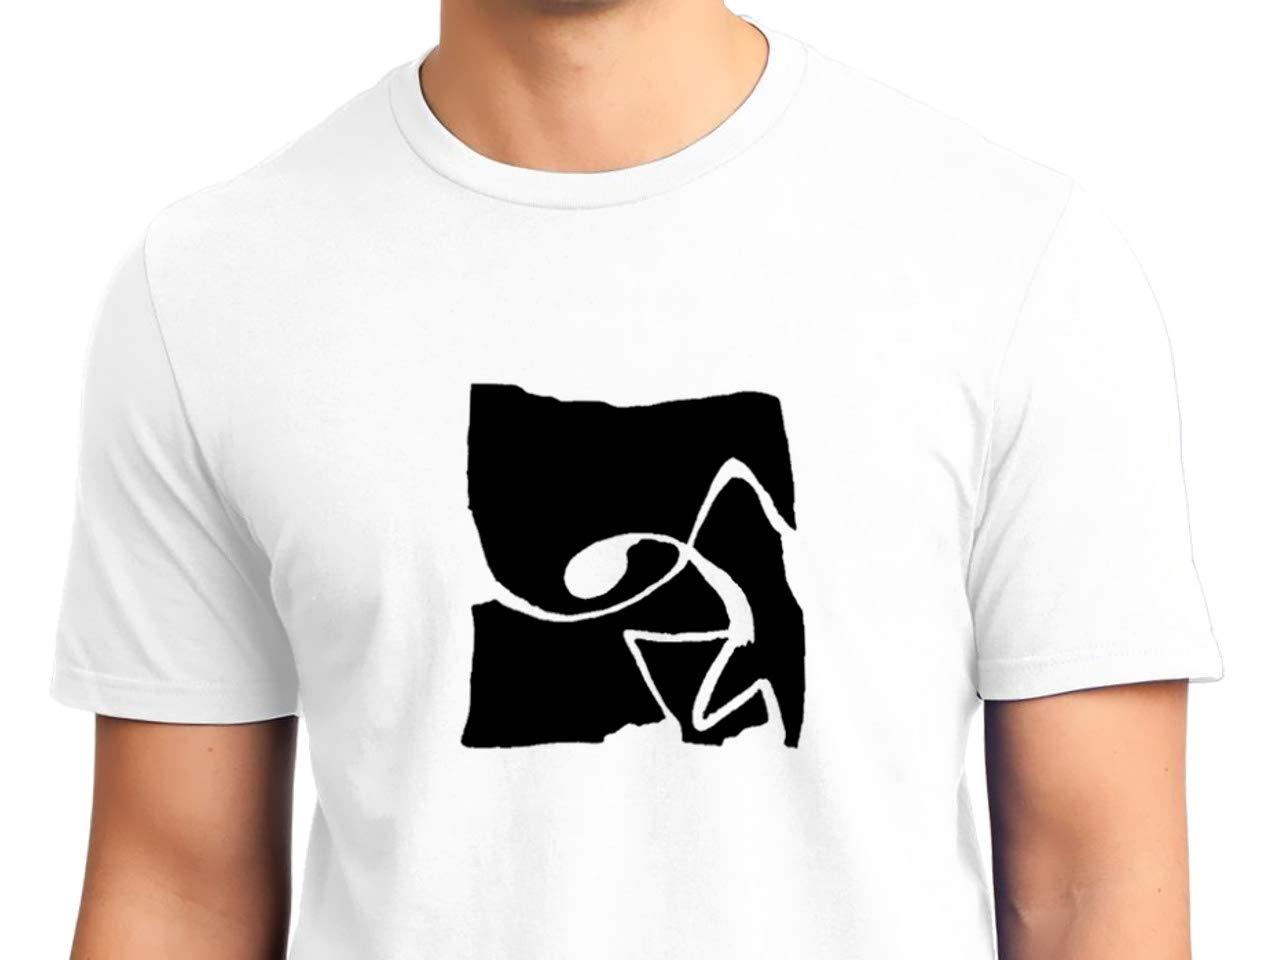 Atlas Camiseta Hombre de Manga Corta: Amazon.es: Handmade